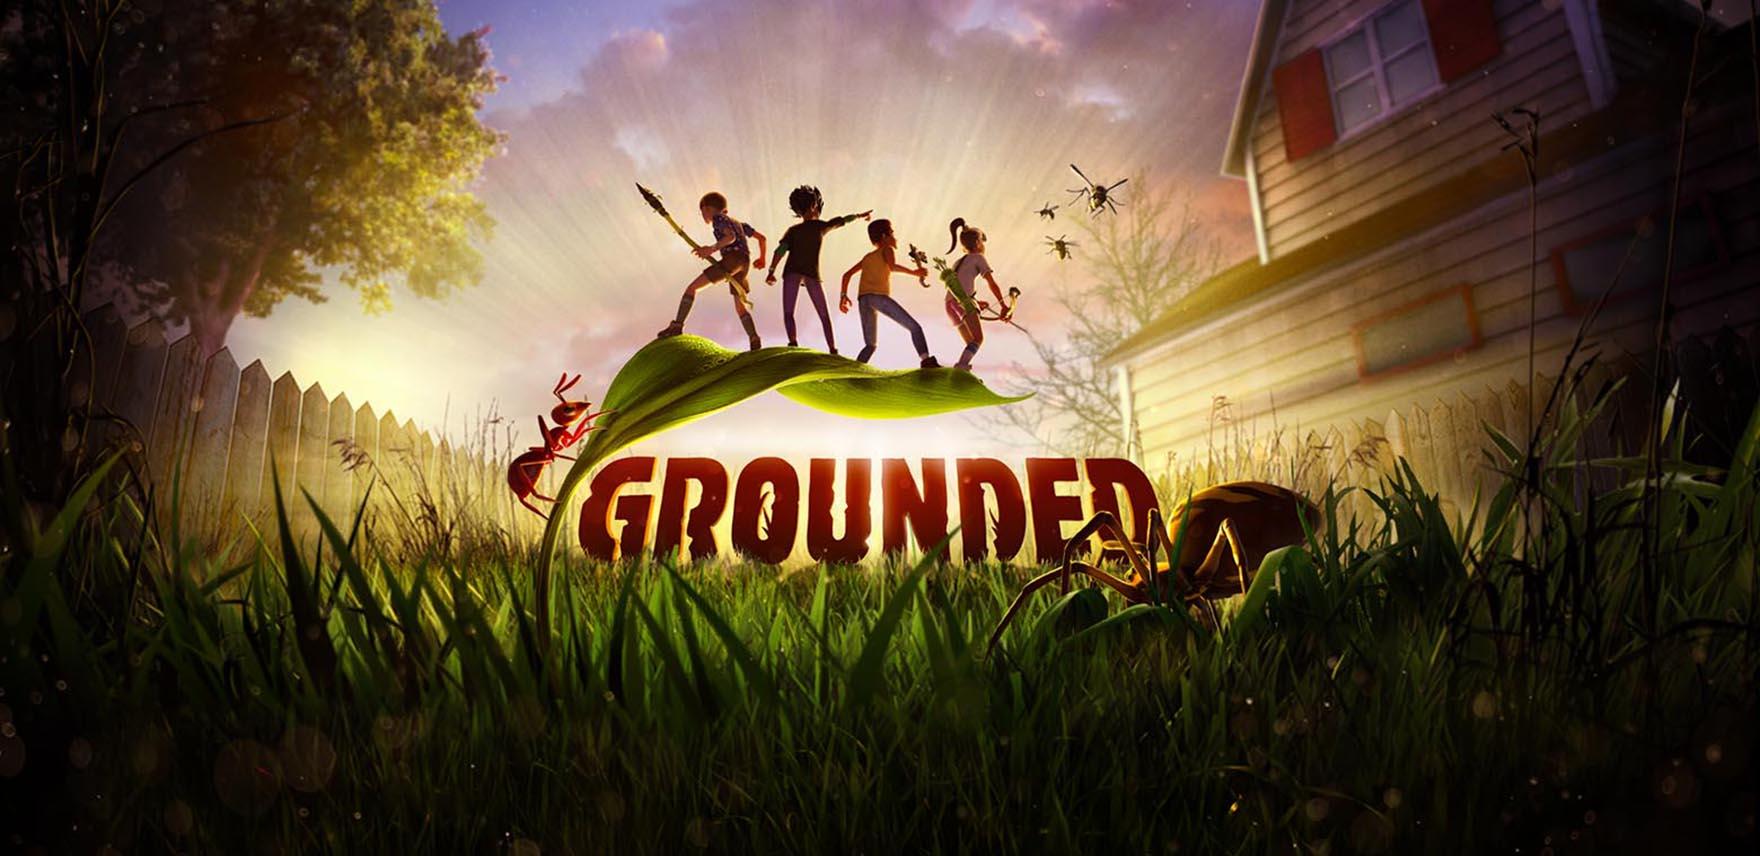 grounded | Tekno Deha